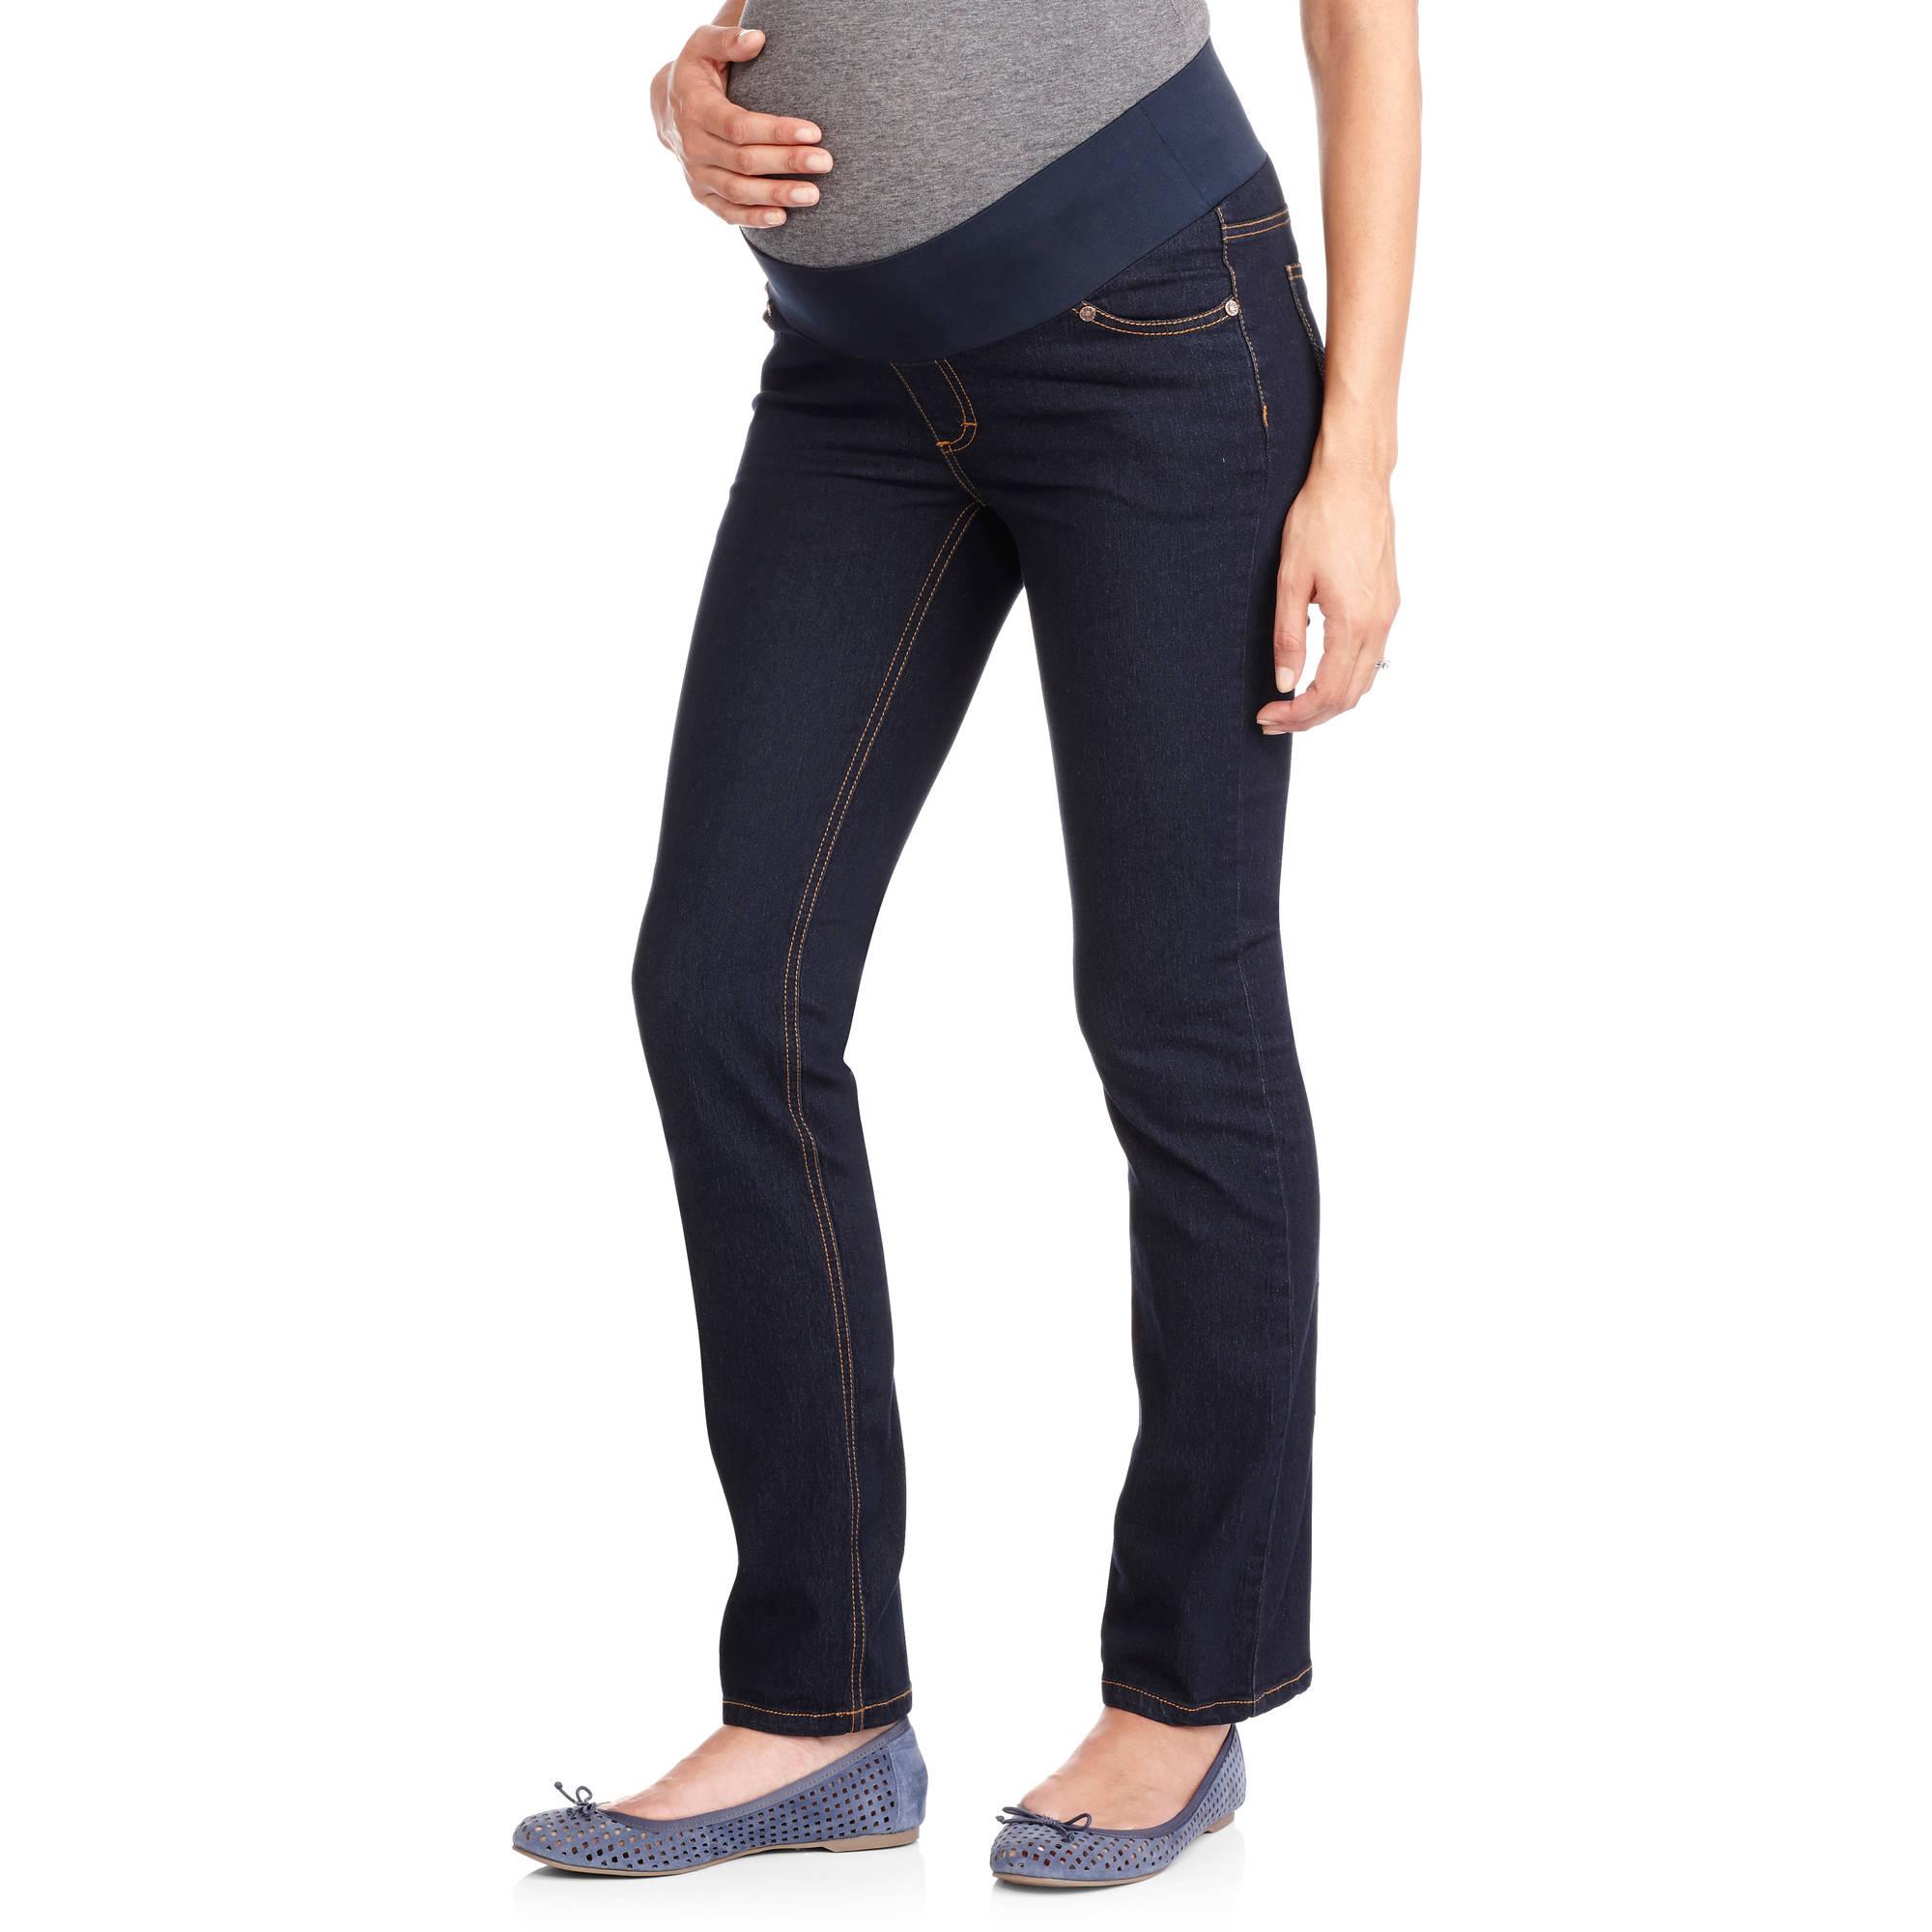 Oh! Mamma Maternity Demi-Panel Super Soft Straight Leg Jeans